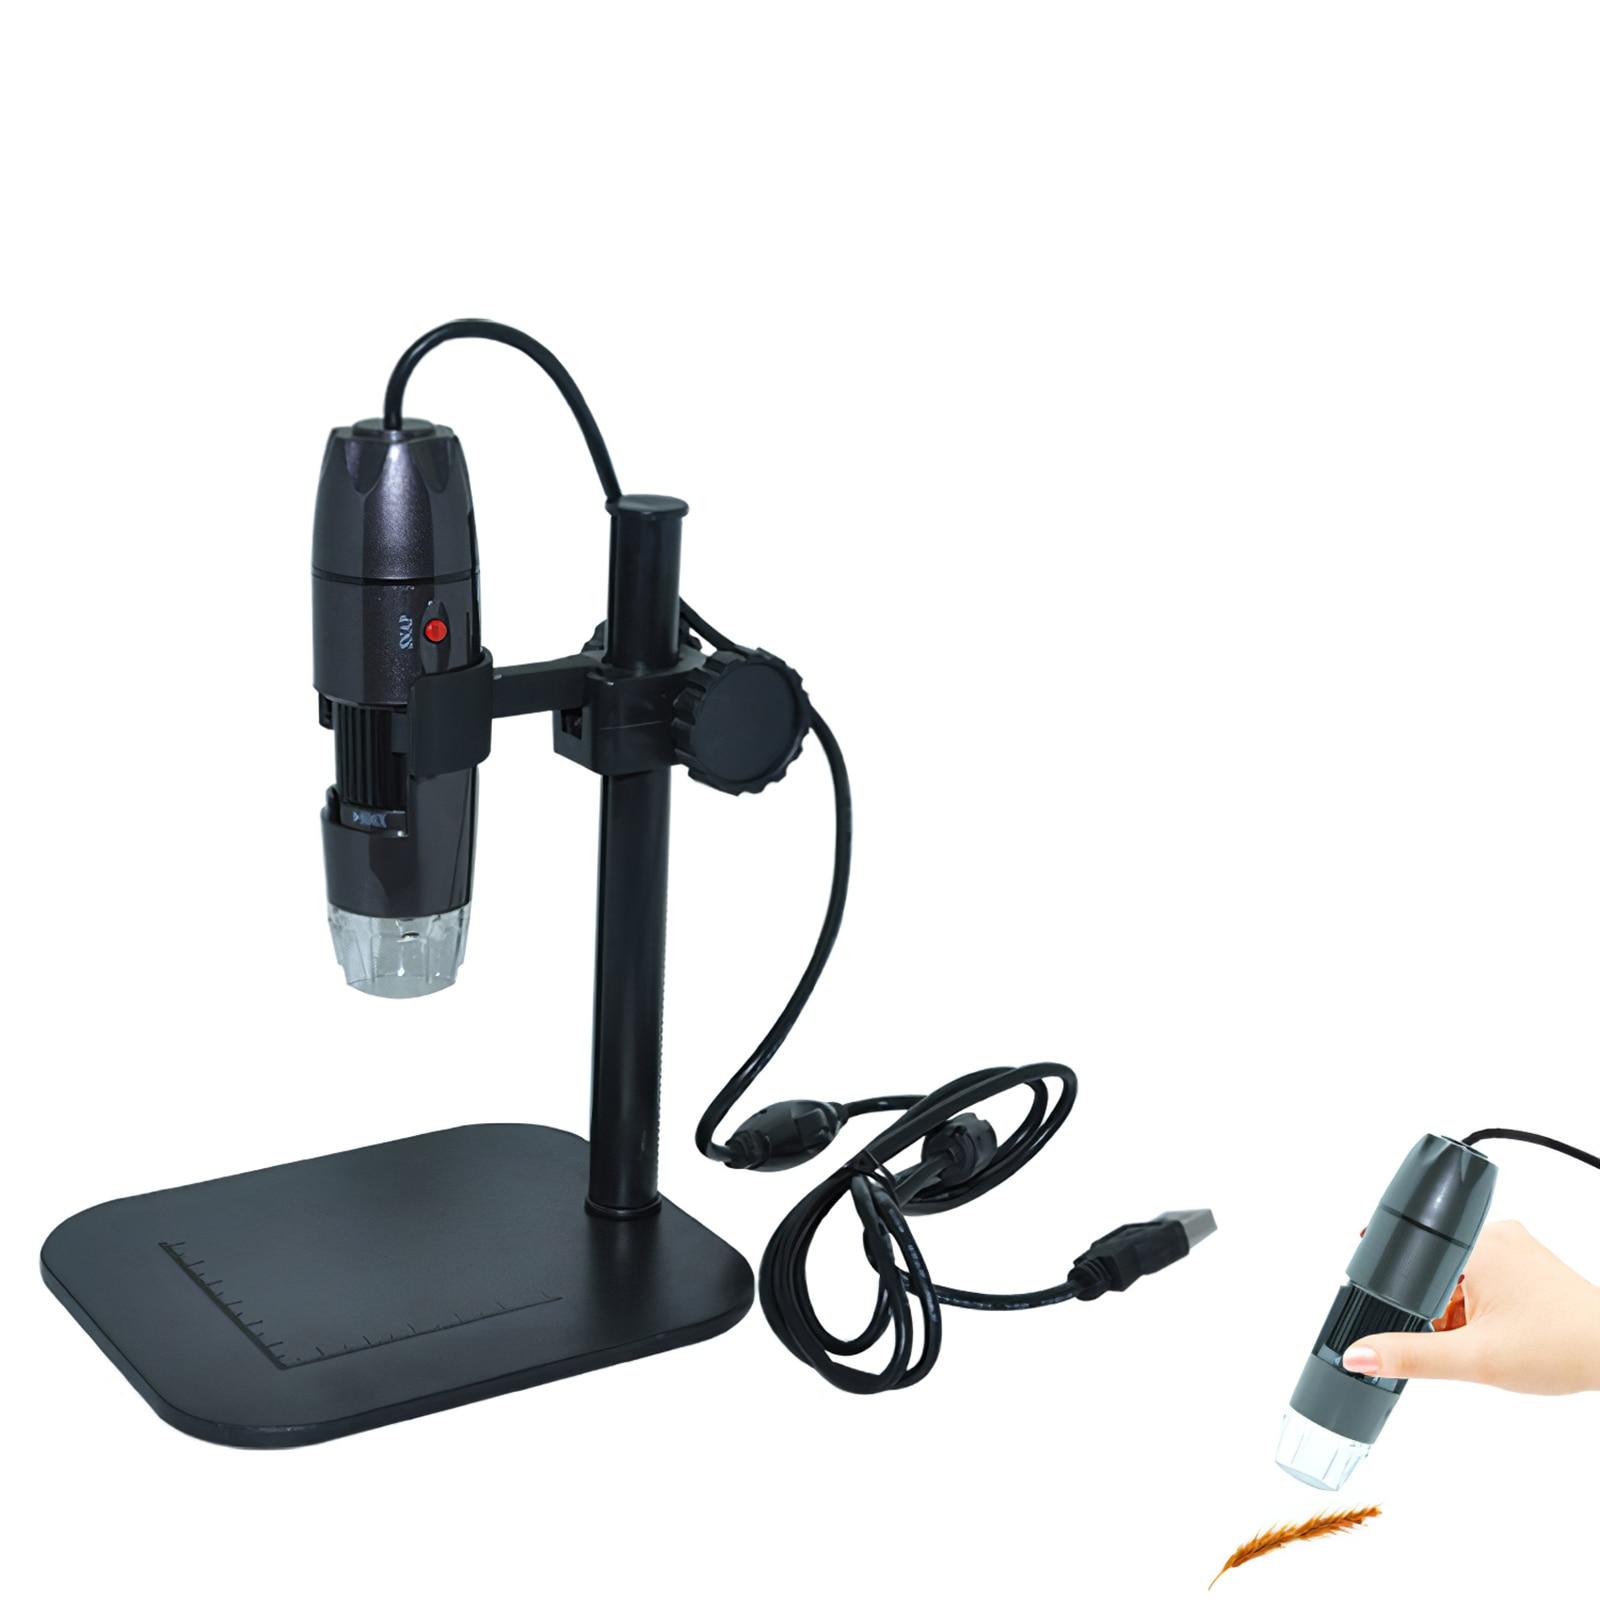 XSC Microscope Holder Stand Bracket Holder Universal Microscope Bracket Portable USB Digital Electronic Table Microscopes supereyes b005 200x usb digital portable manual focus microscope w tripod set silver